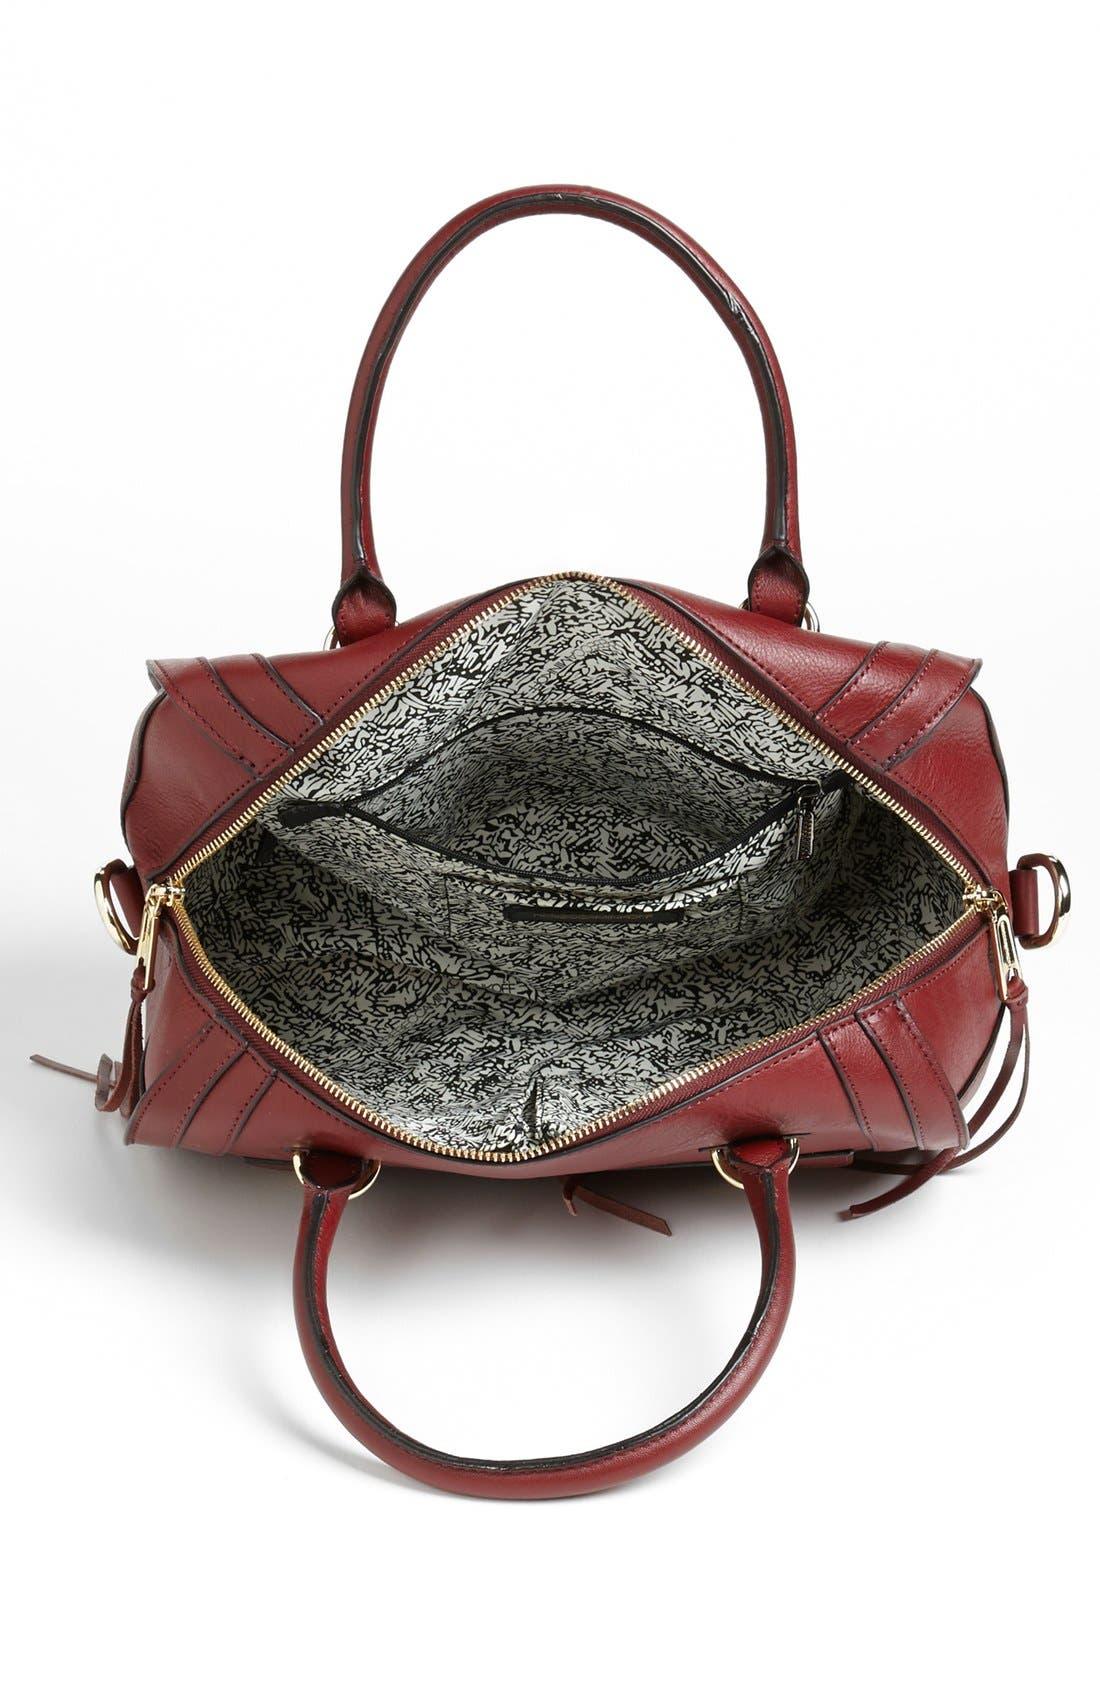 Alternate Image 3  - Rebecca Minkoff 'Darcy' Leather Satchel (Nordstrom Exclusive)